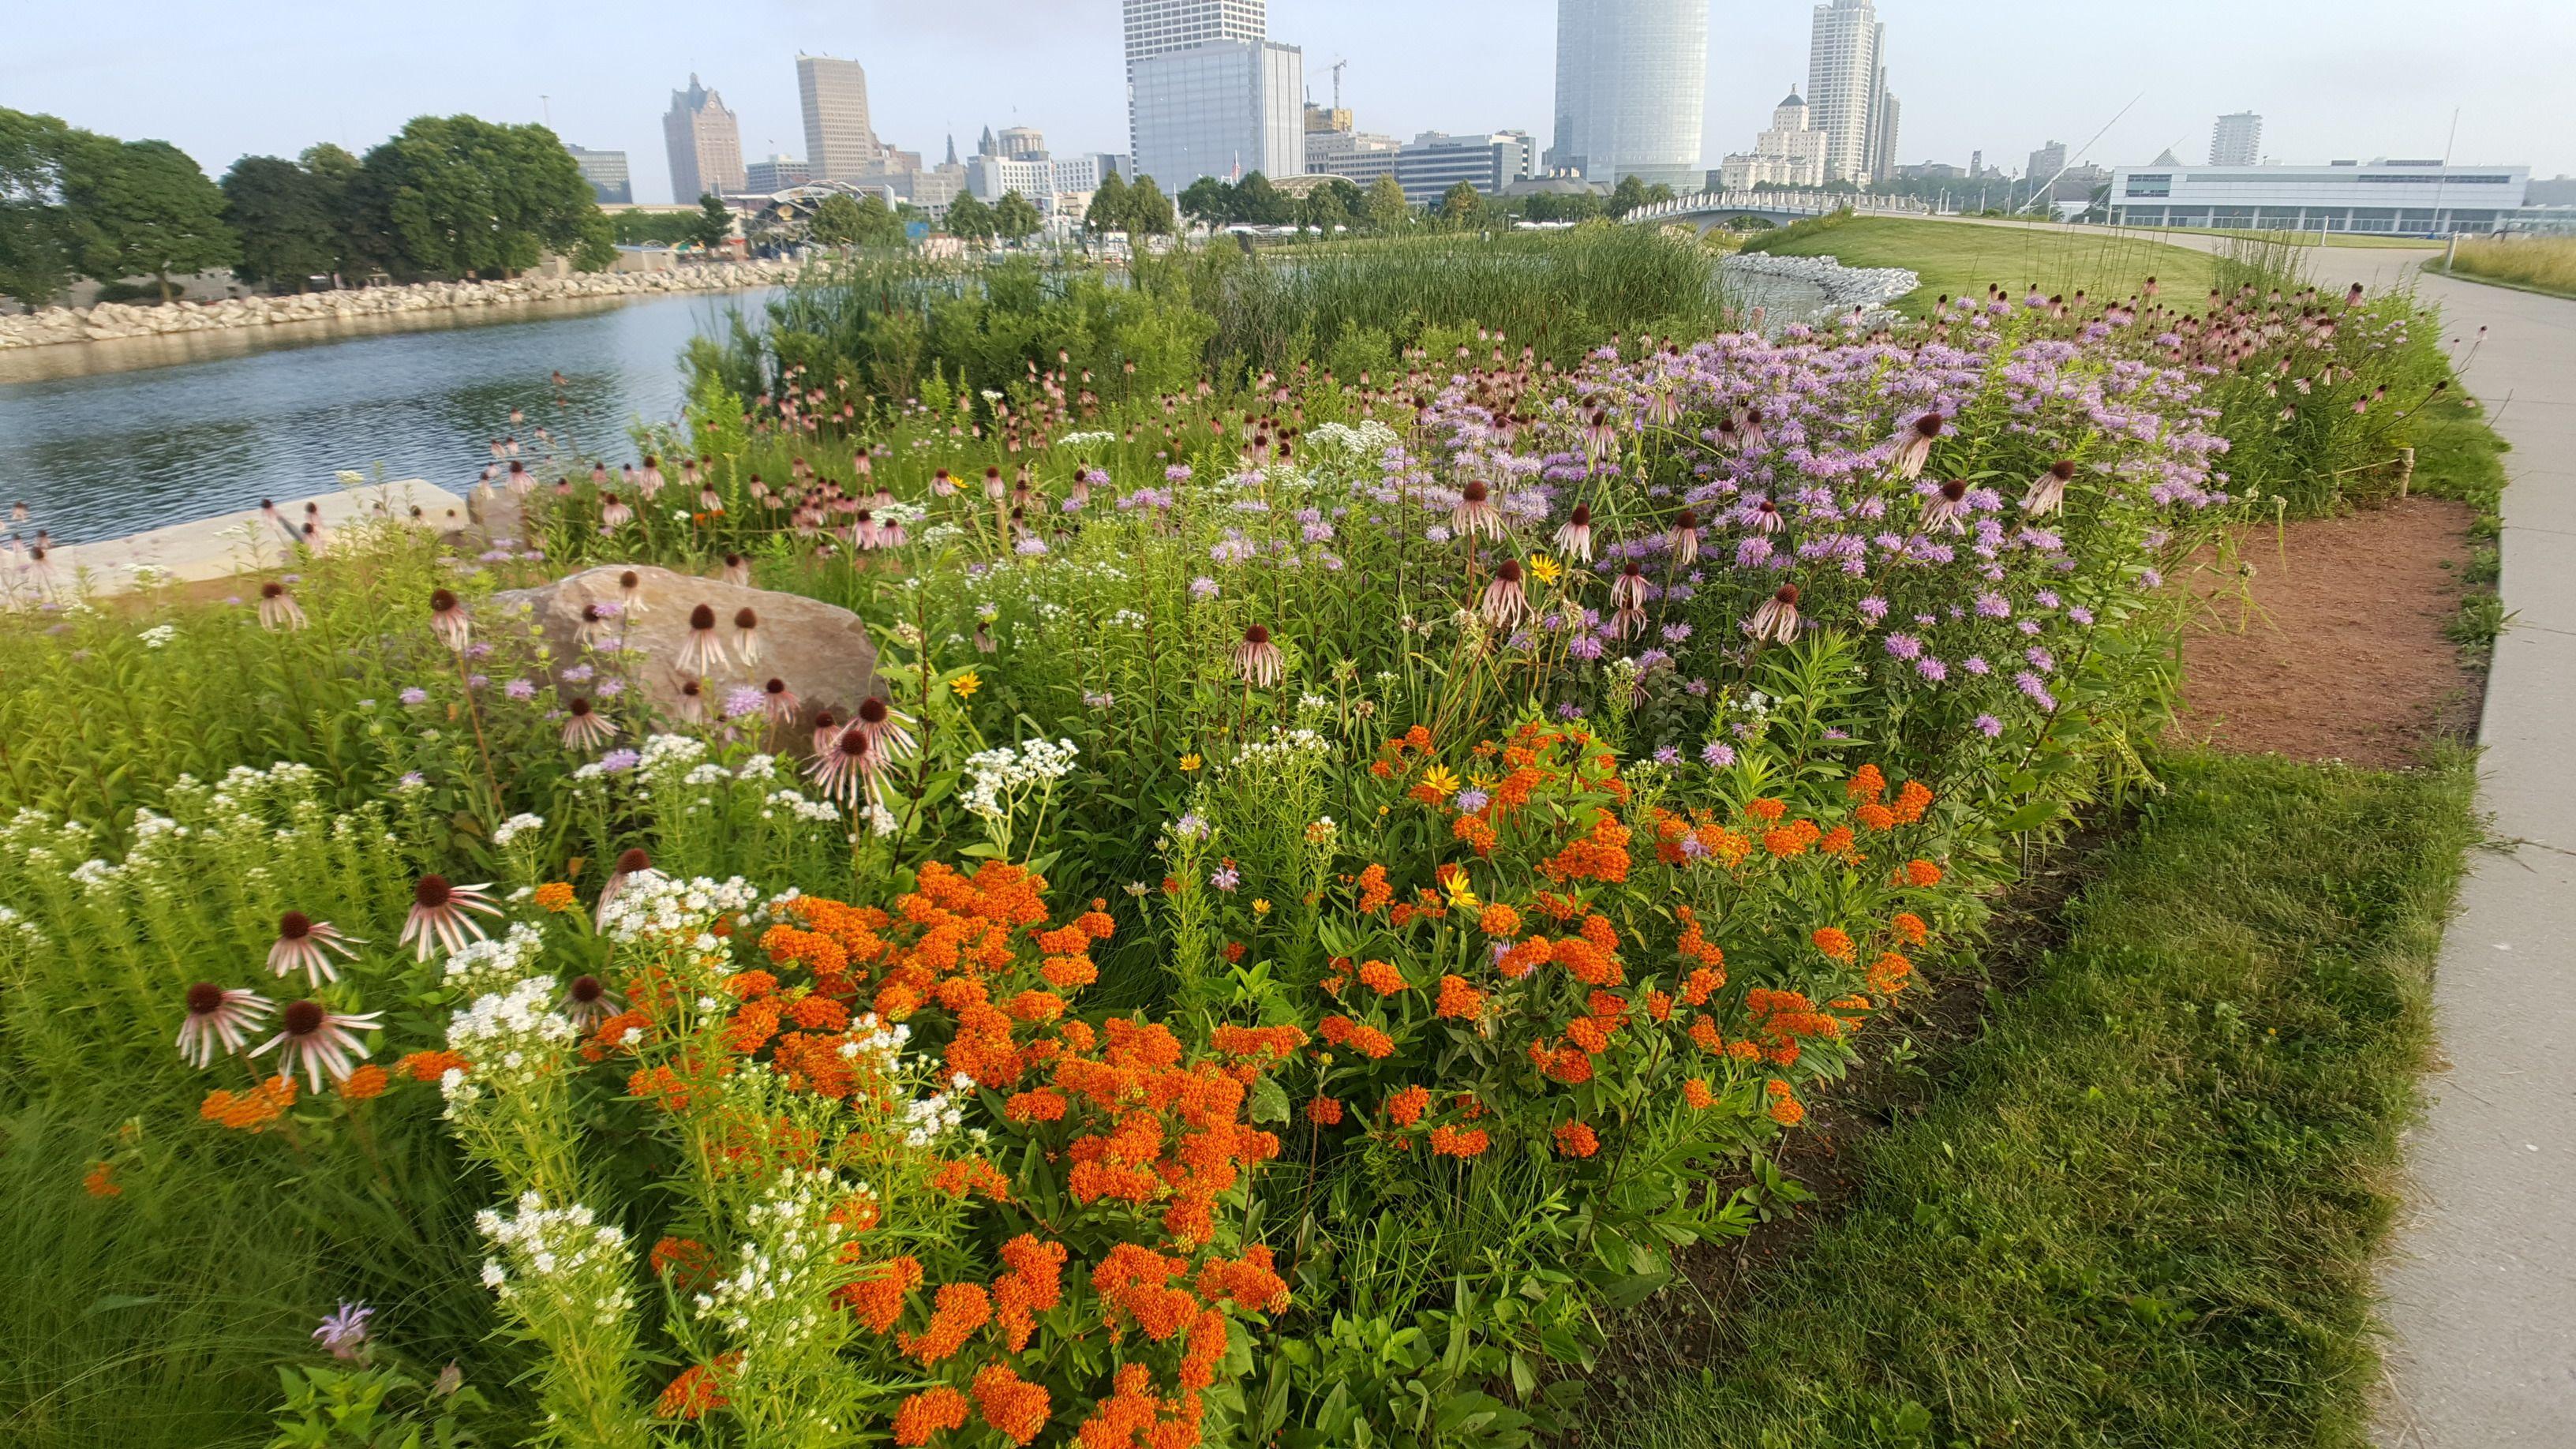 Pin by Prairie Nursery on Garden Ideas | Garden ...